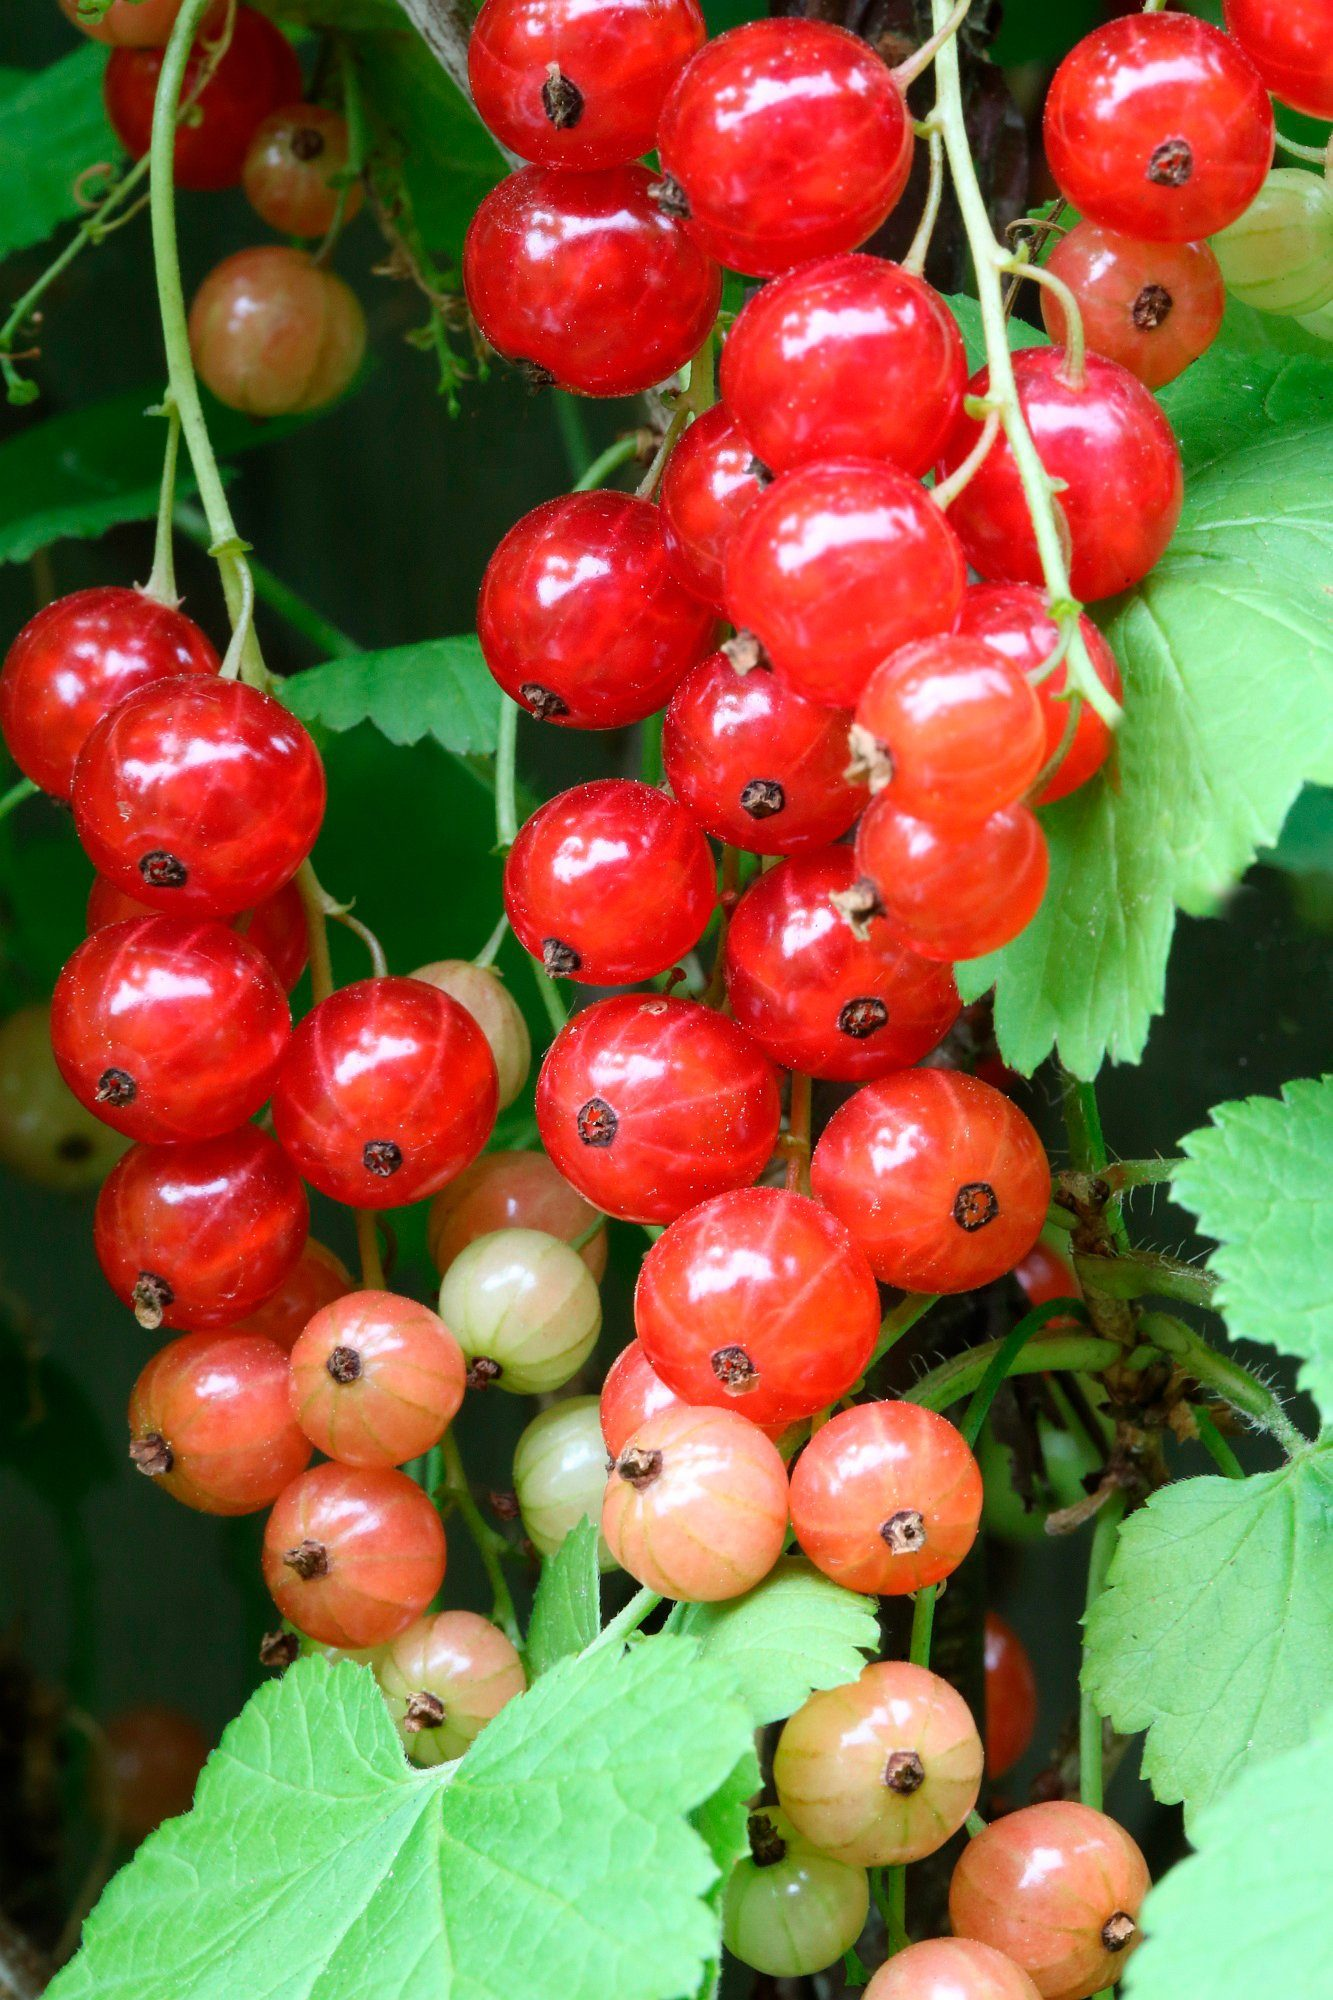 BCM Säulenobst »Rote Johannisbeere Rondom«, Höhe: 50 cm, 2 Pflanzen